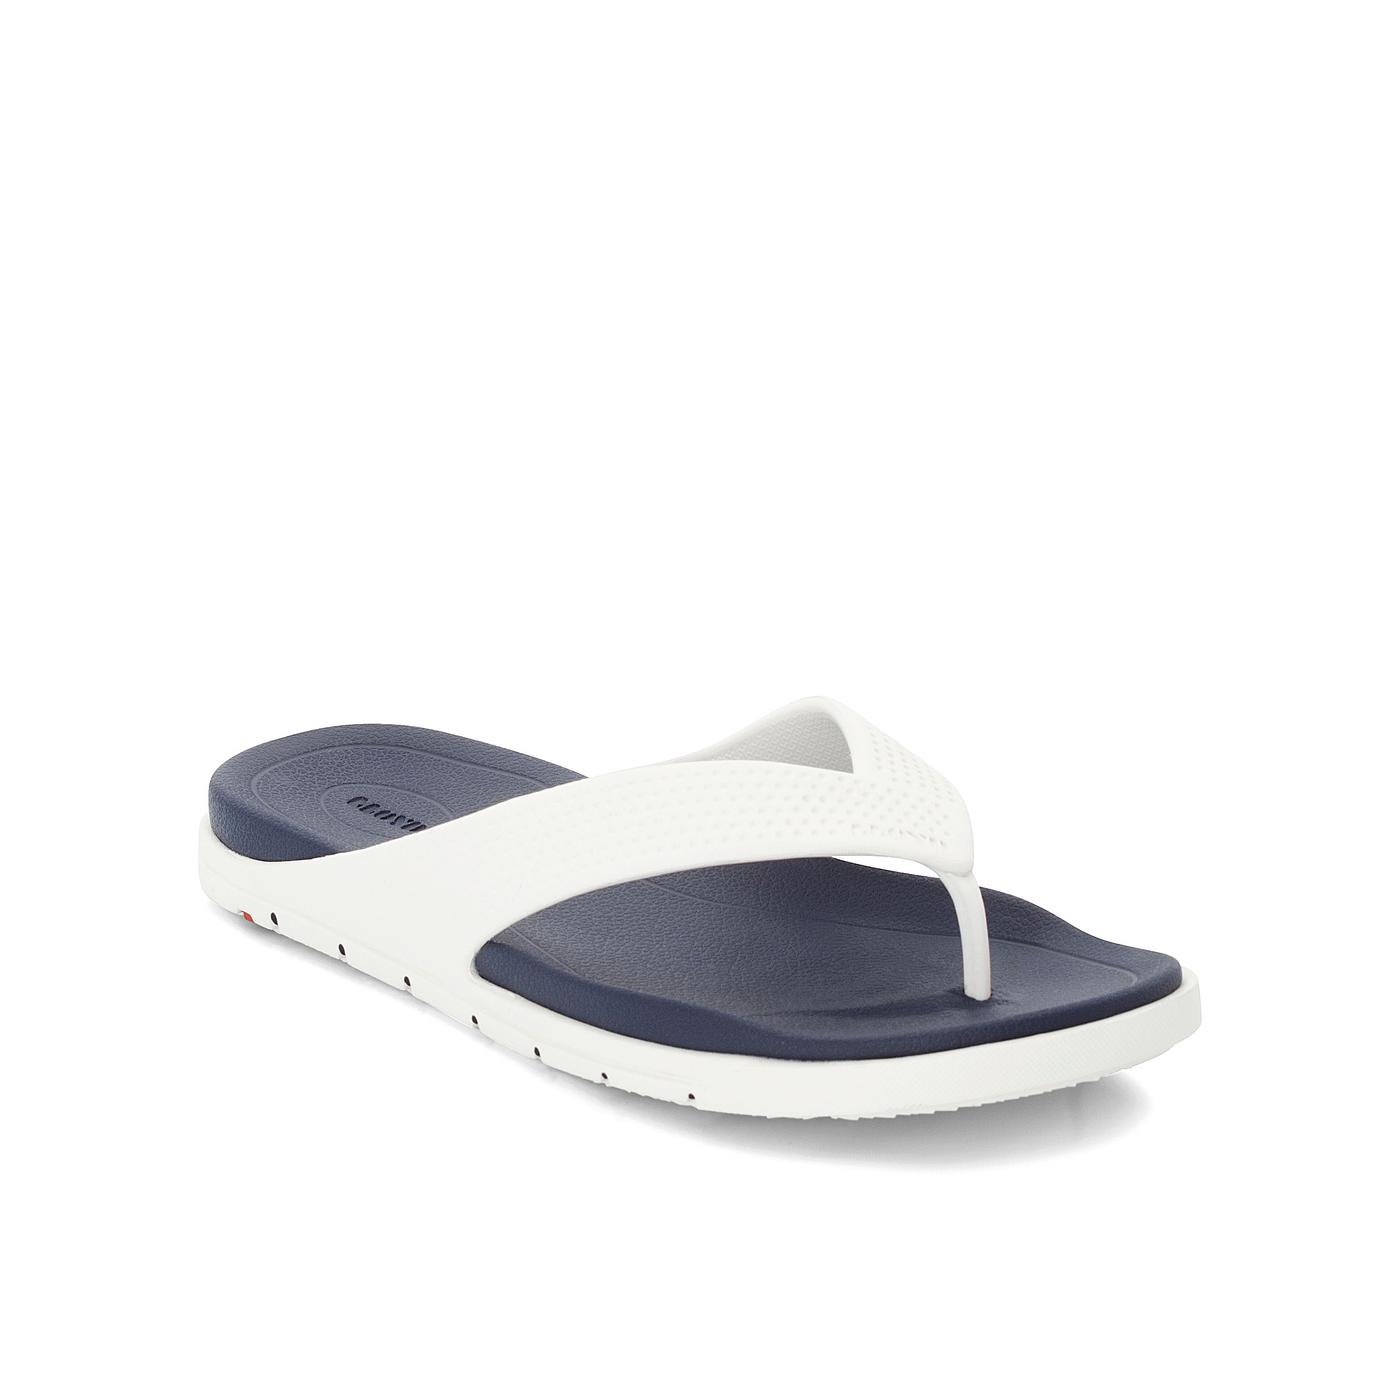 Beach Sandale | Schuhe > Sandalen & Zehentrenner > Sandalen | Lloyd